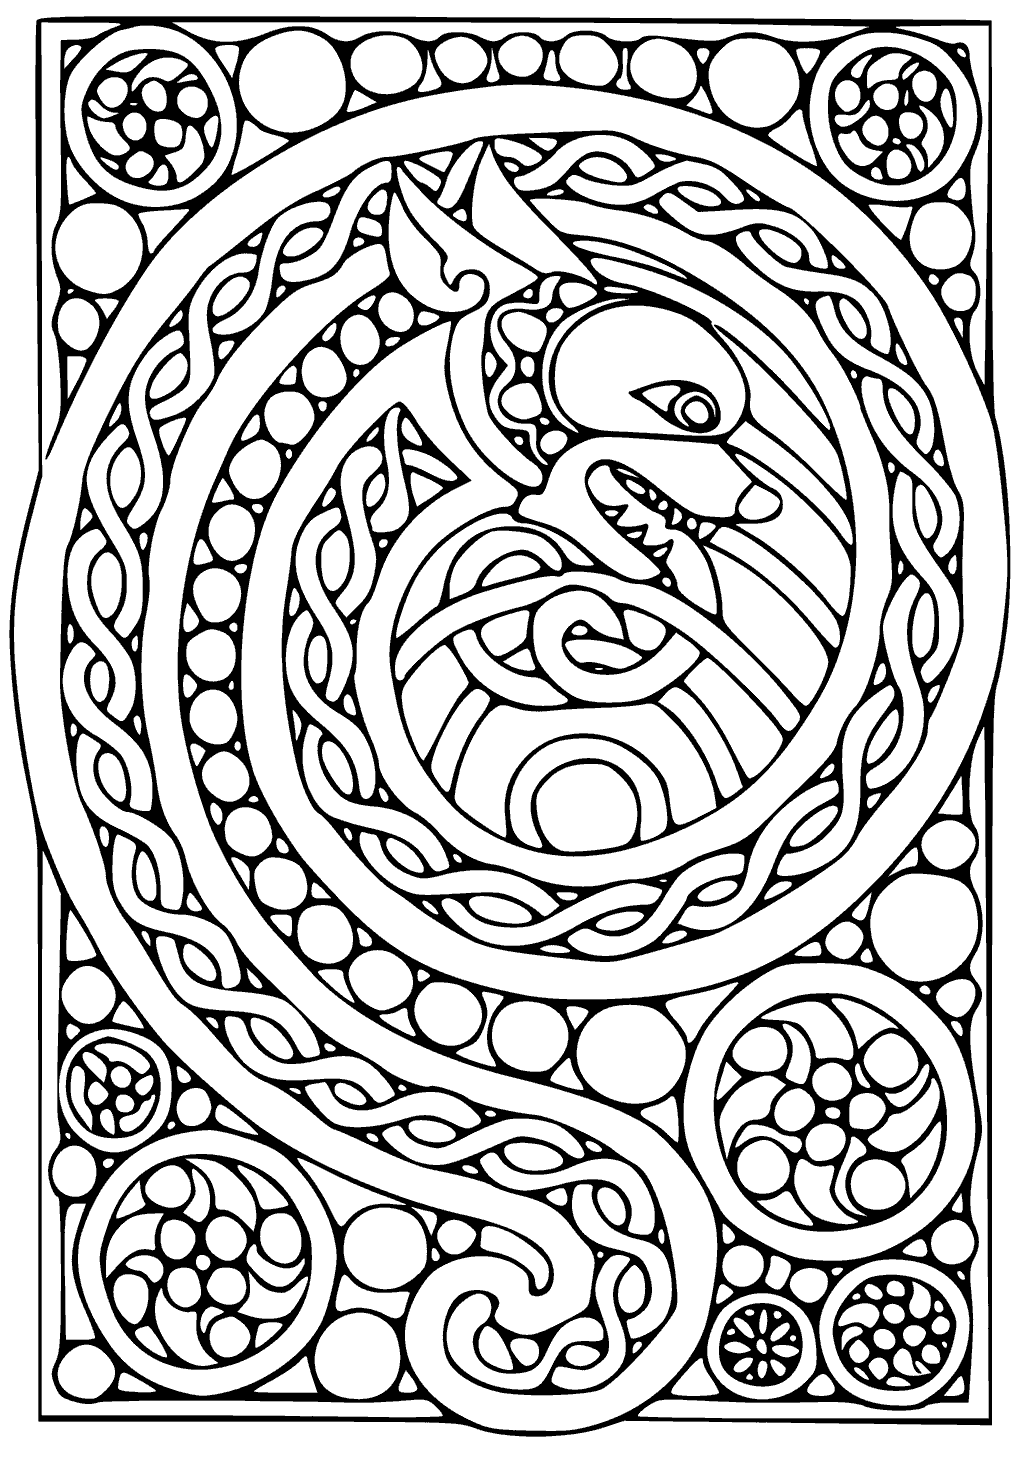 celtic art colouring pages celtic coloring pages best coloring pages for kids celtic pages art colouring